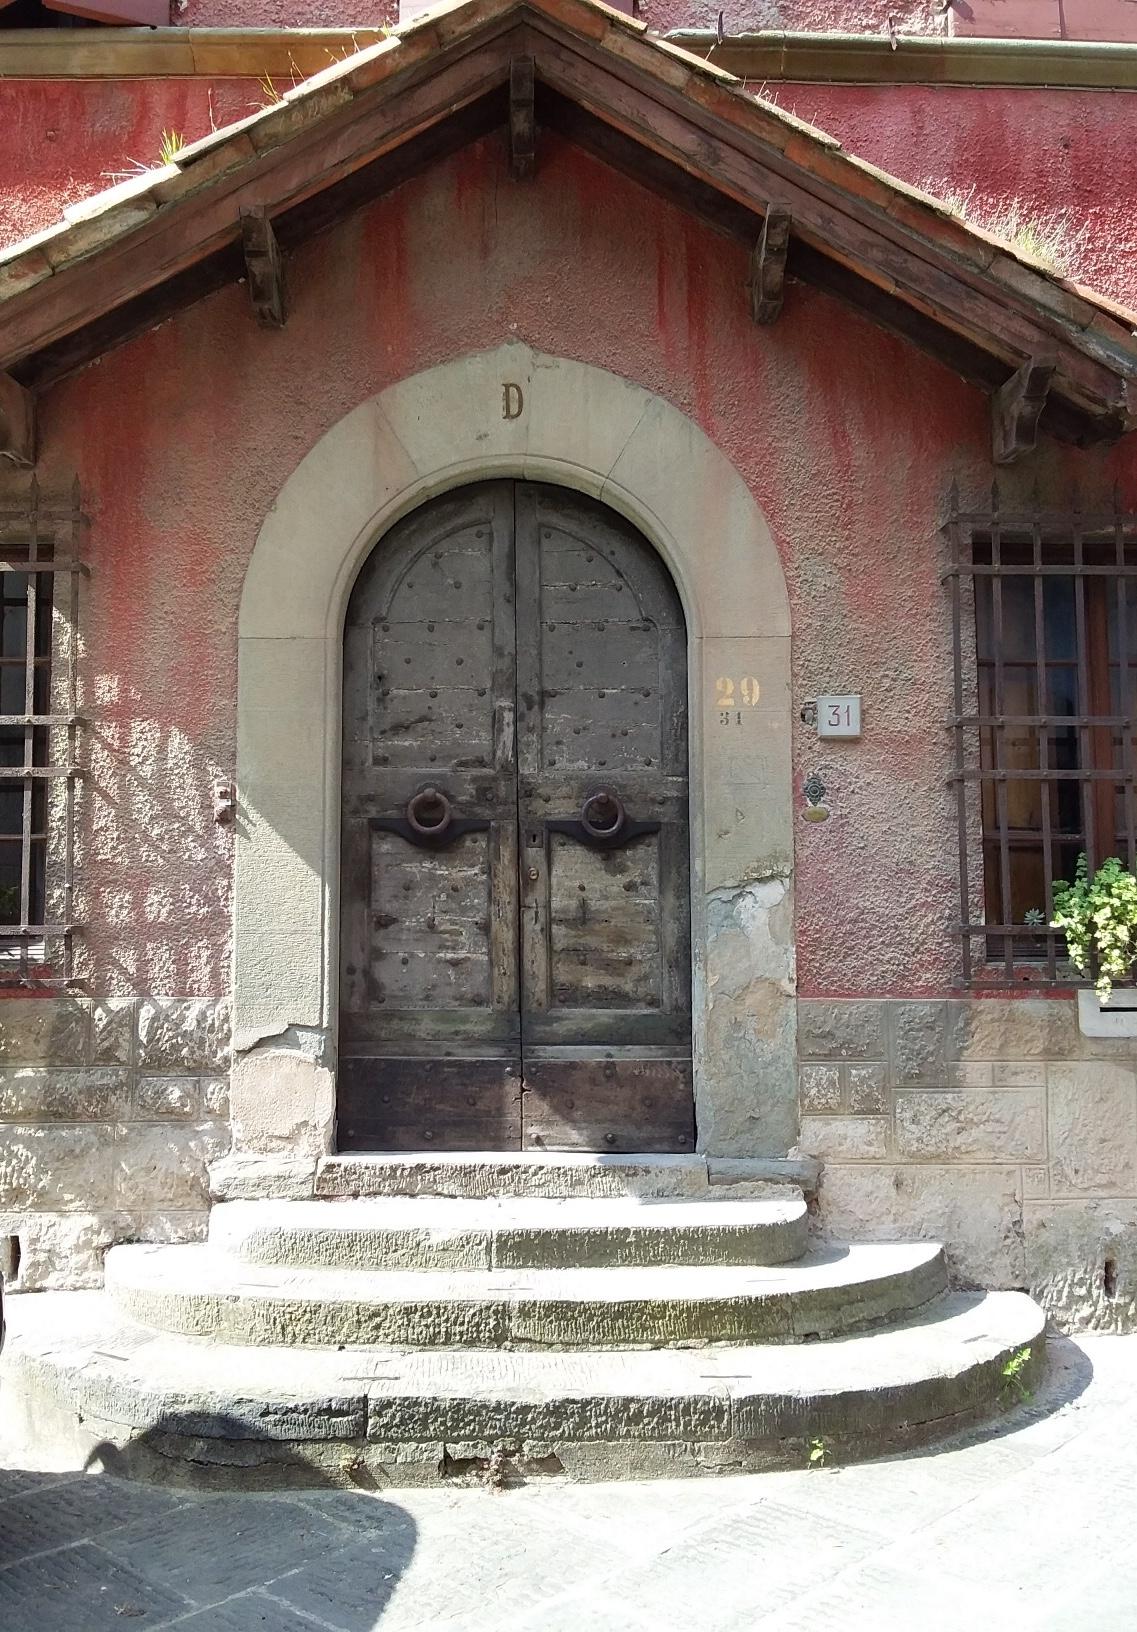 Montecarlo, Tuscany